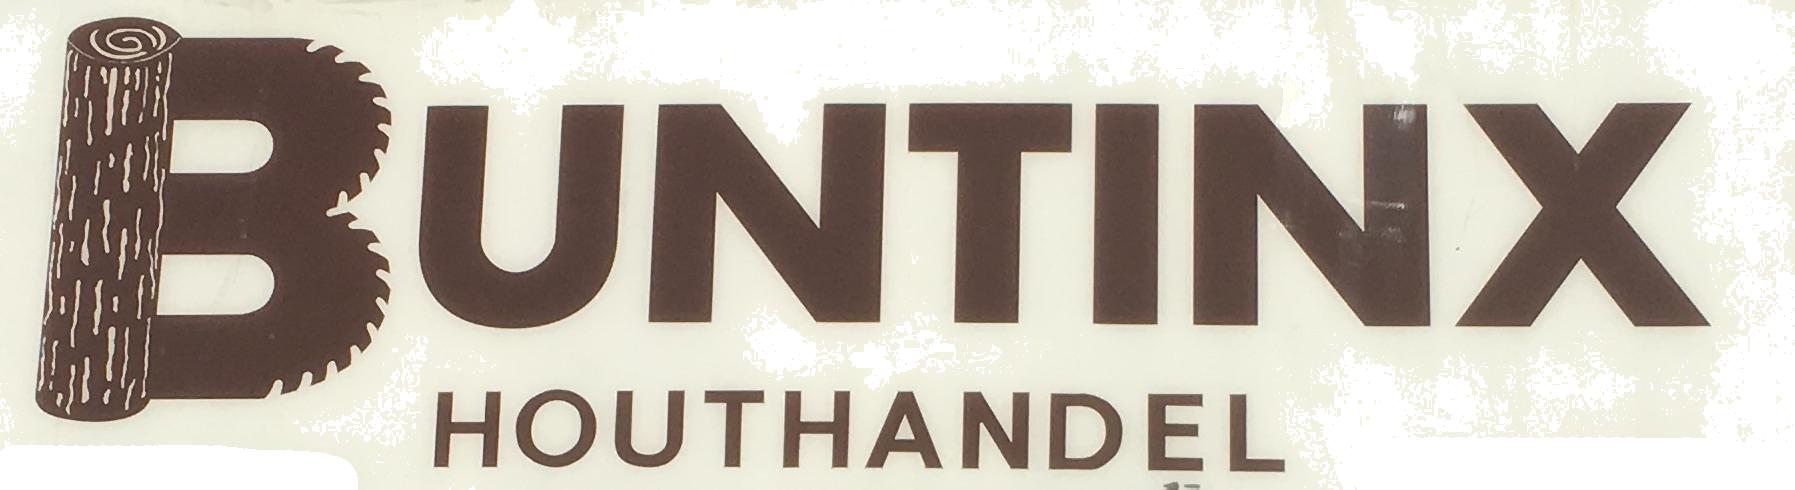 Houthandel Buntinx